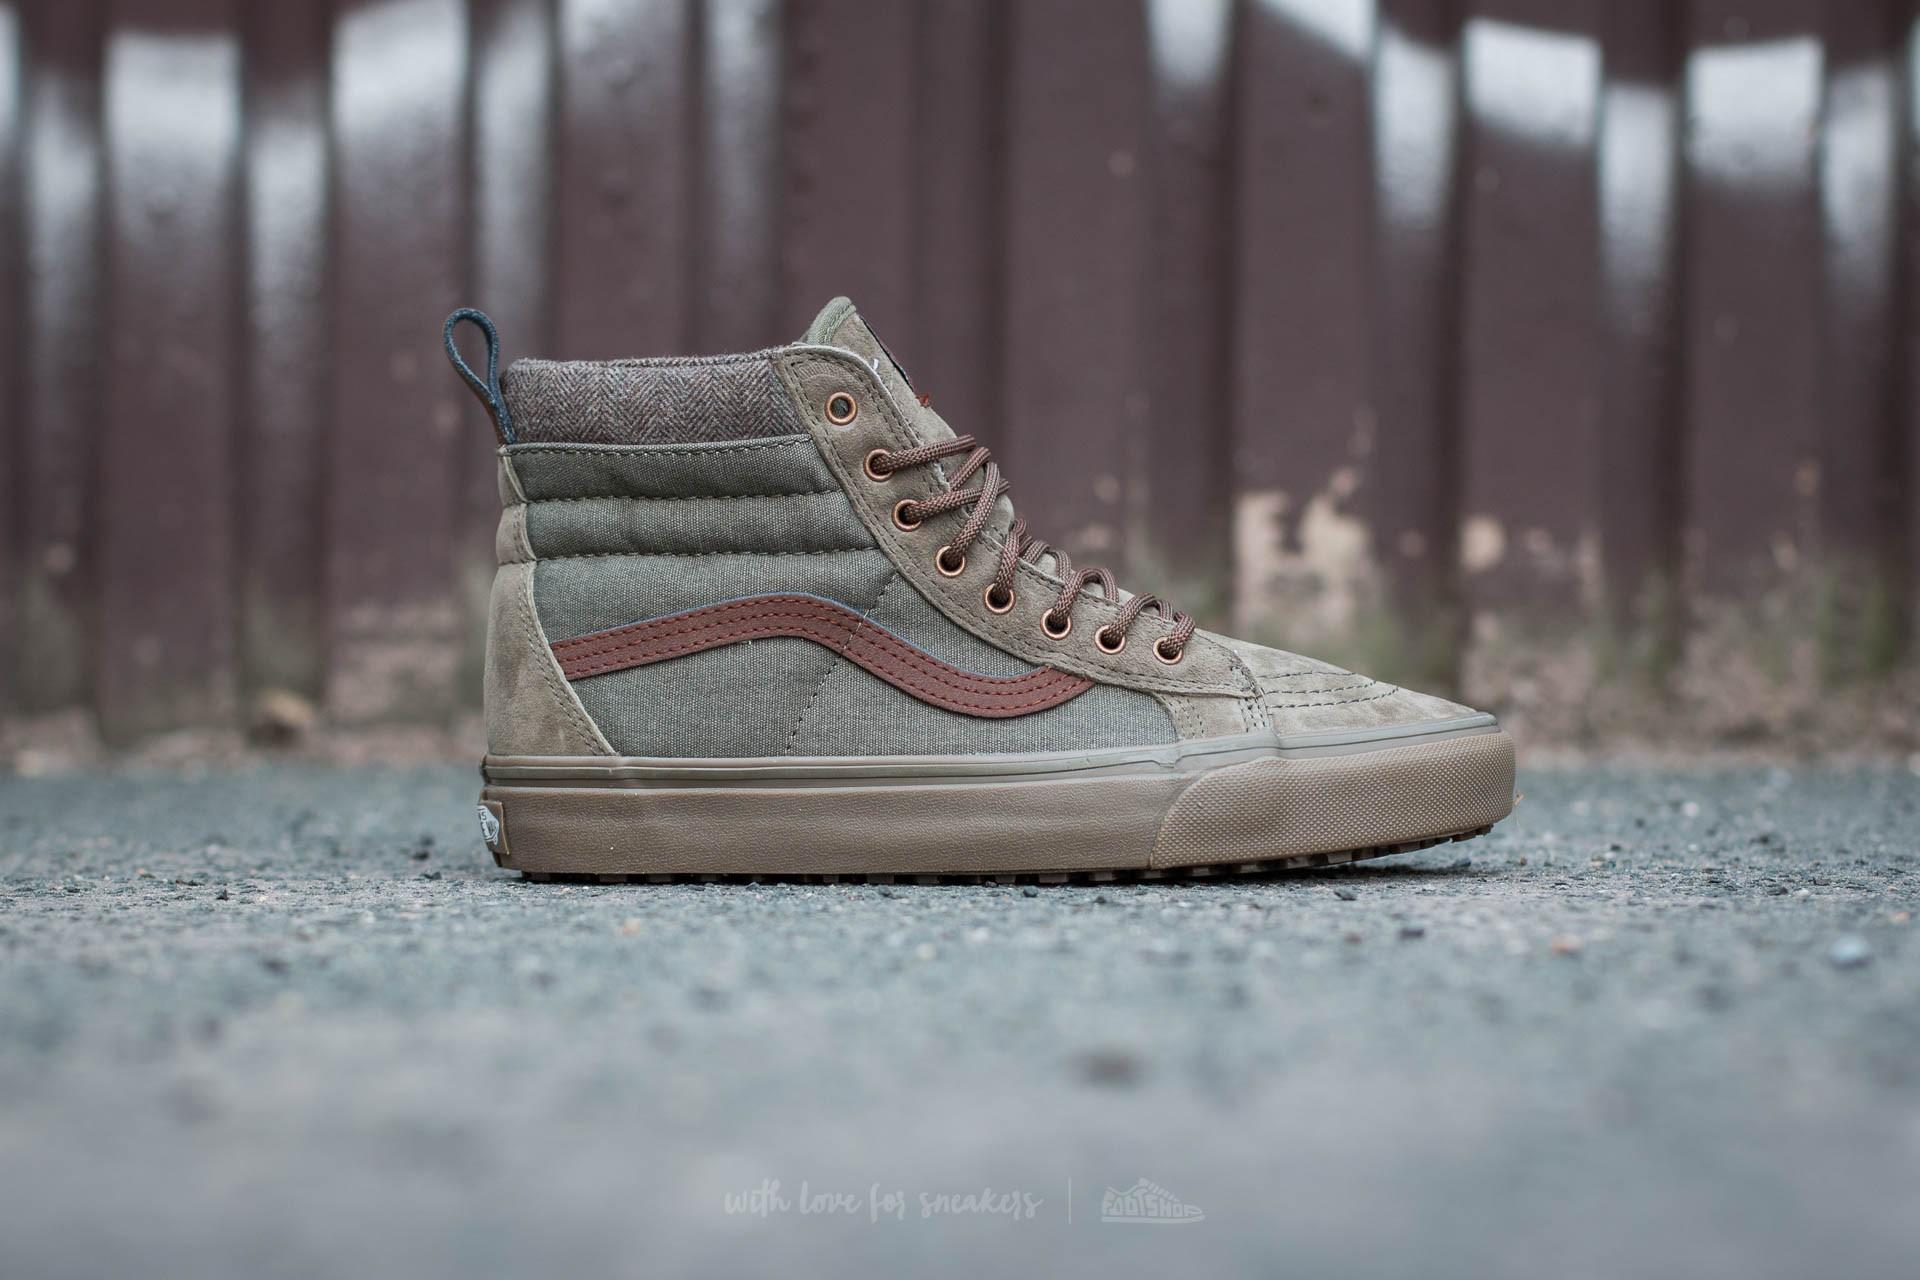 Vans Sk8-Hi MTE DX (MTE) Ivy Green/ Dark Gum | Footshop